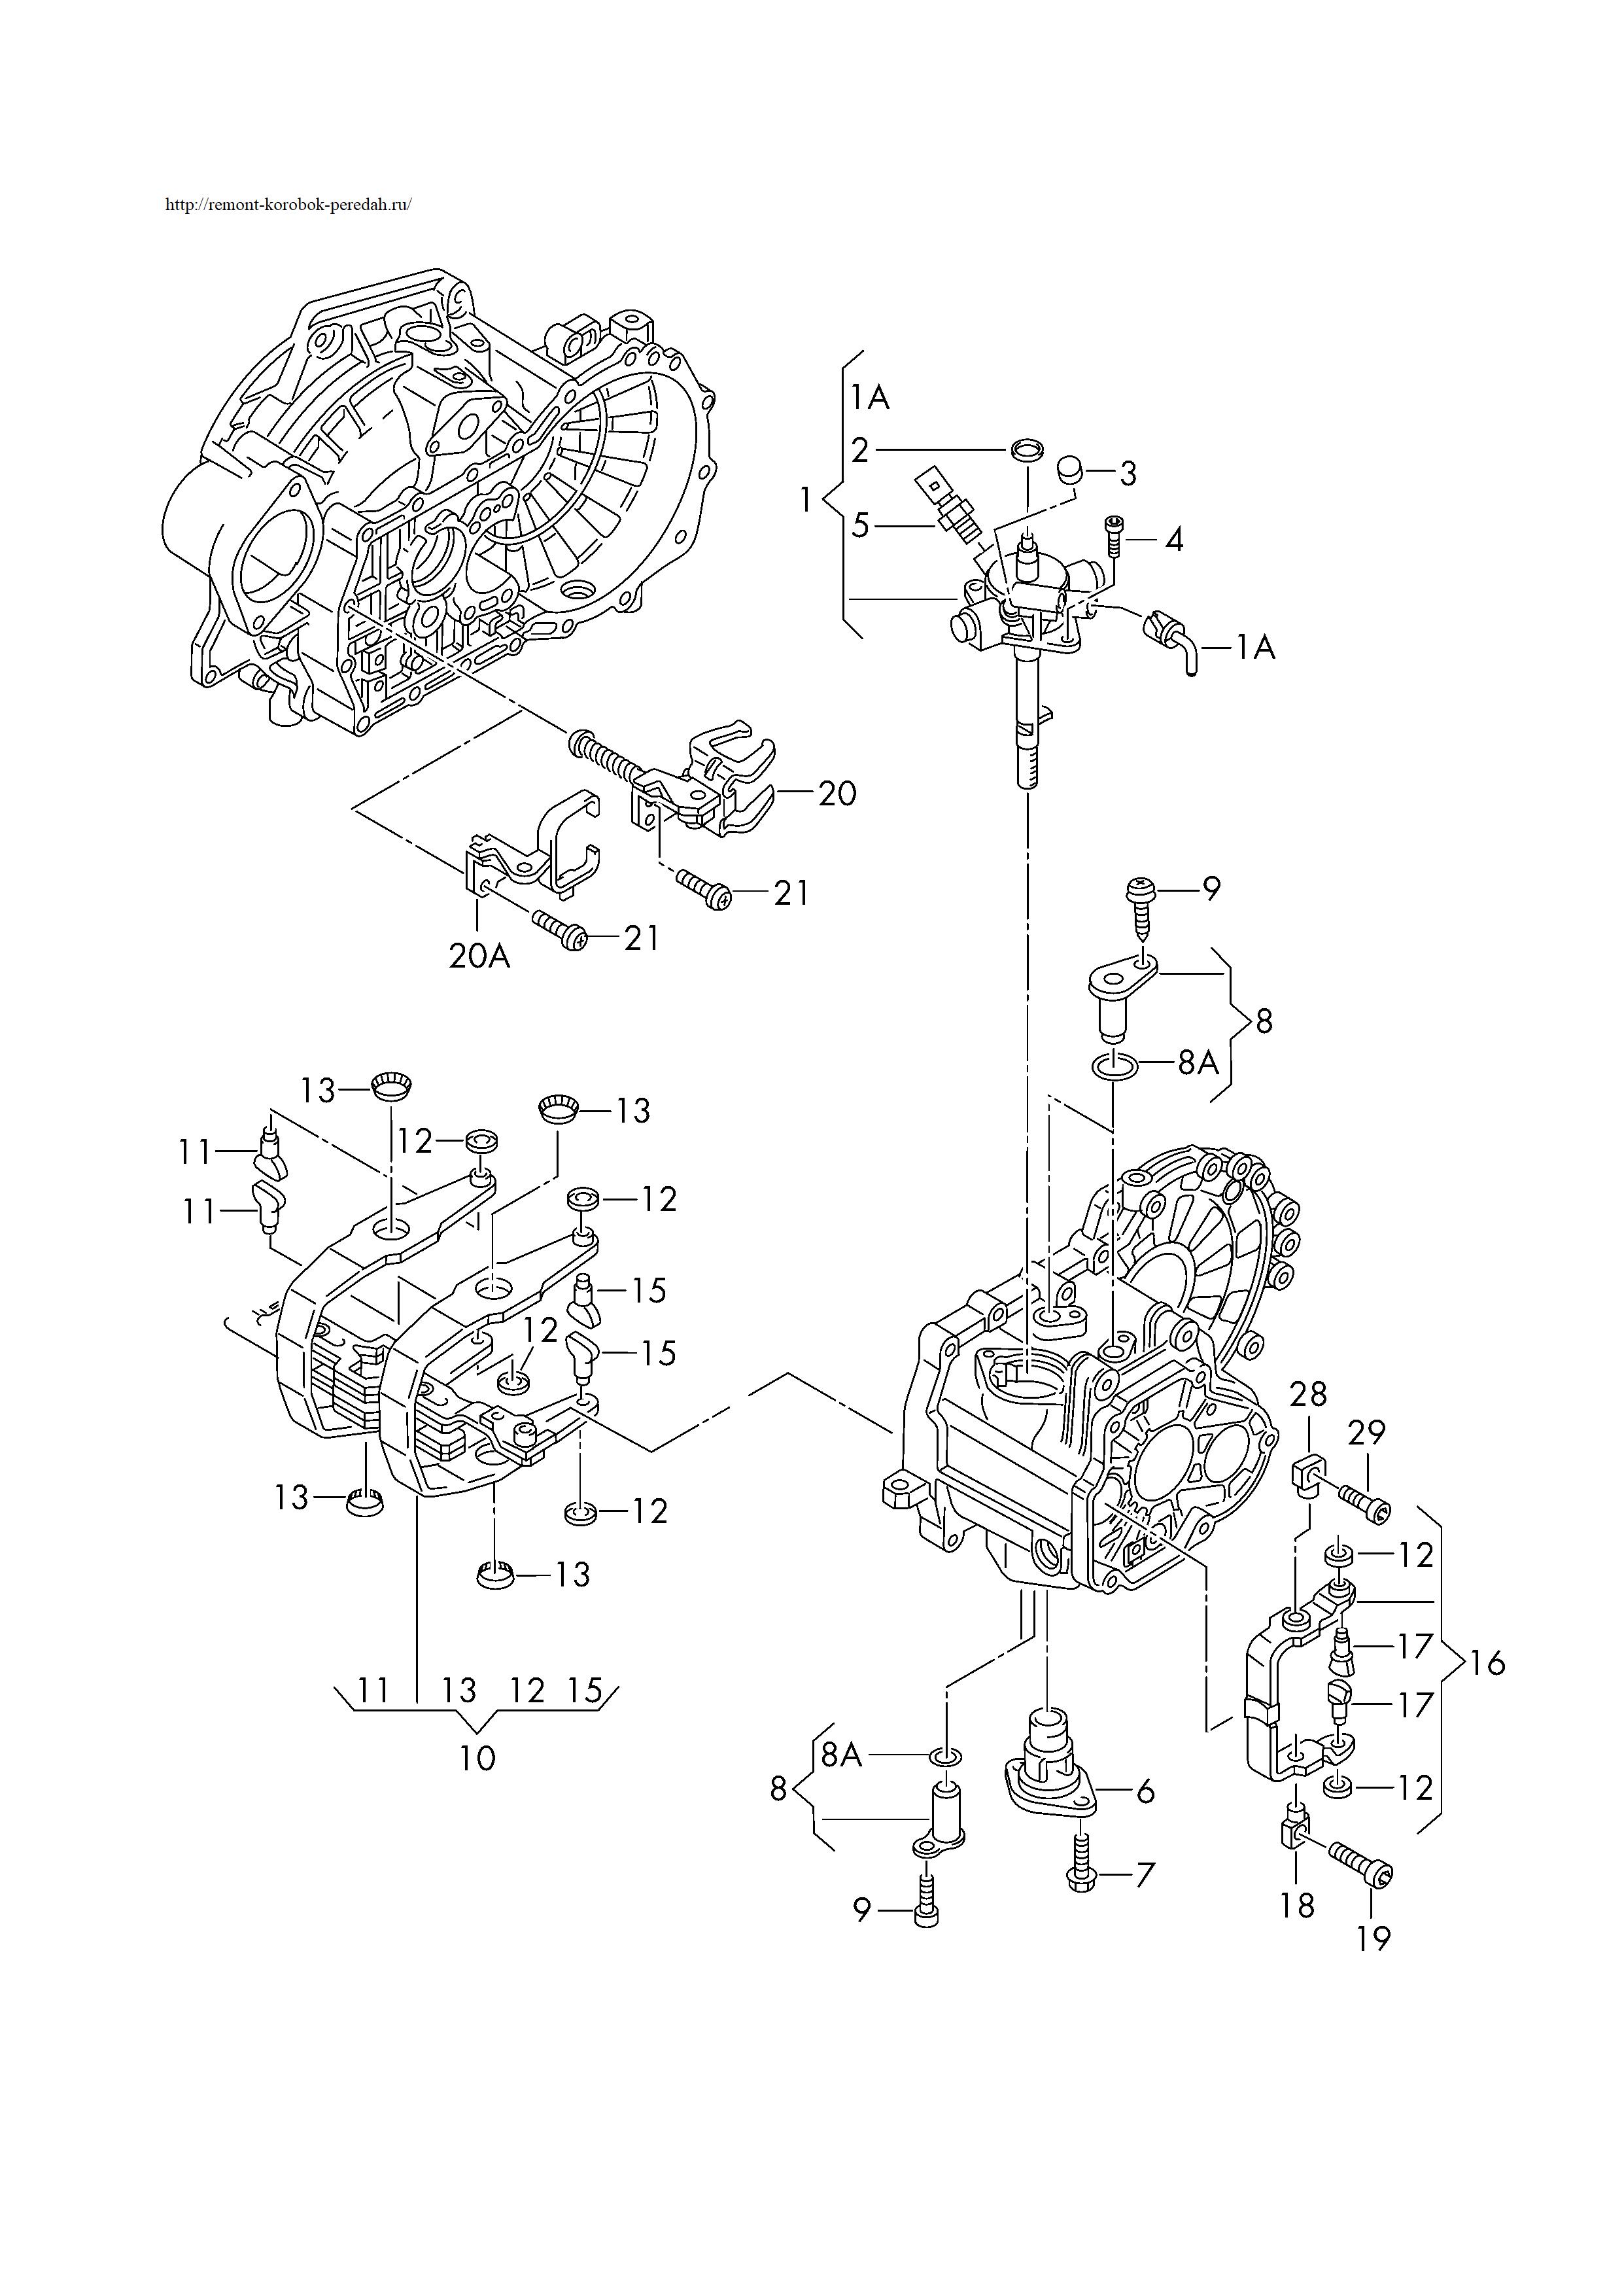 Фольксваген транспортер т4 коробка передач пневмоподвеска на фольксваген транспортер